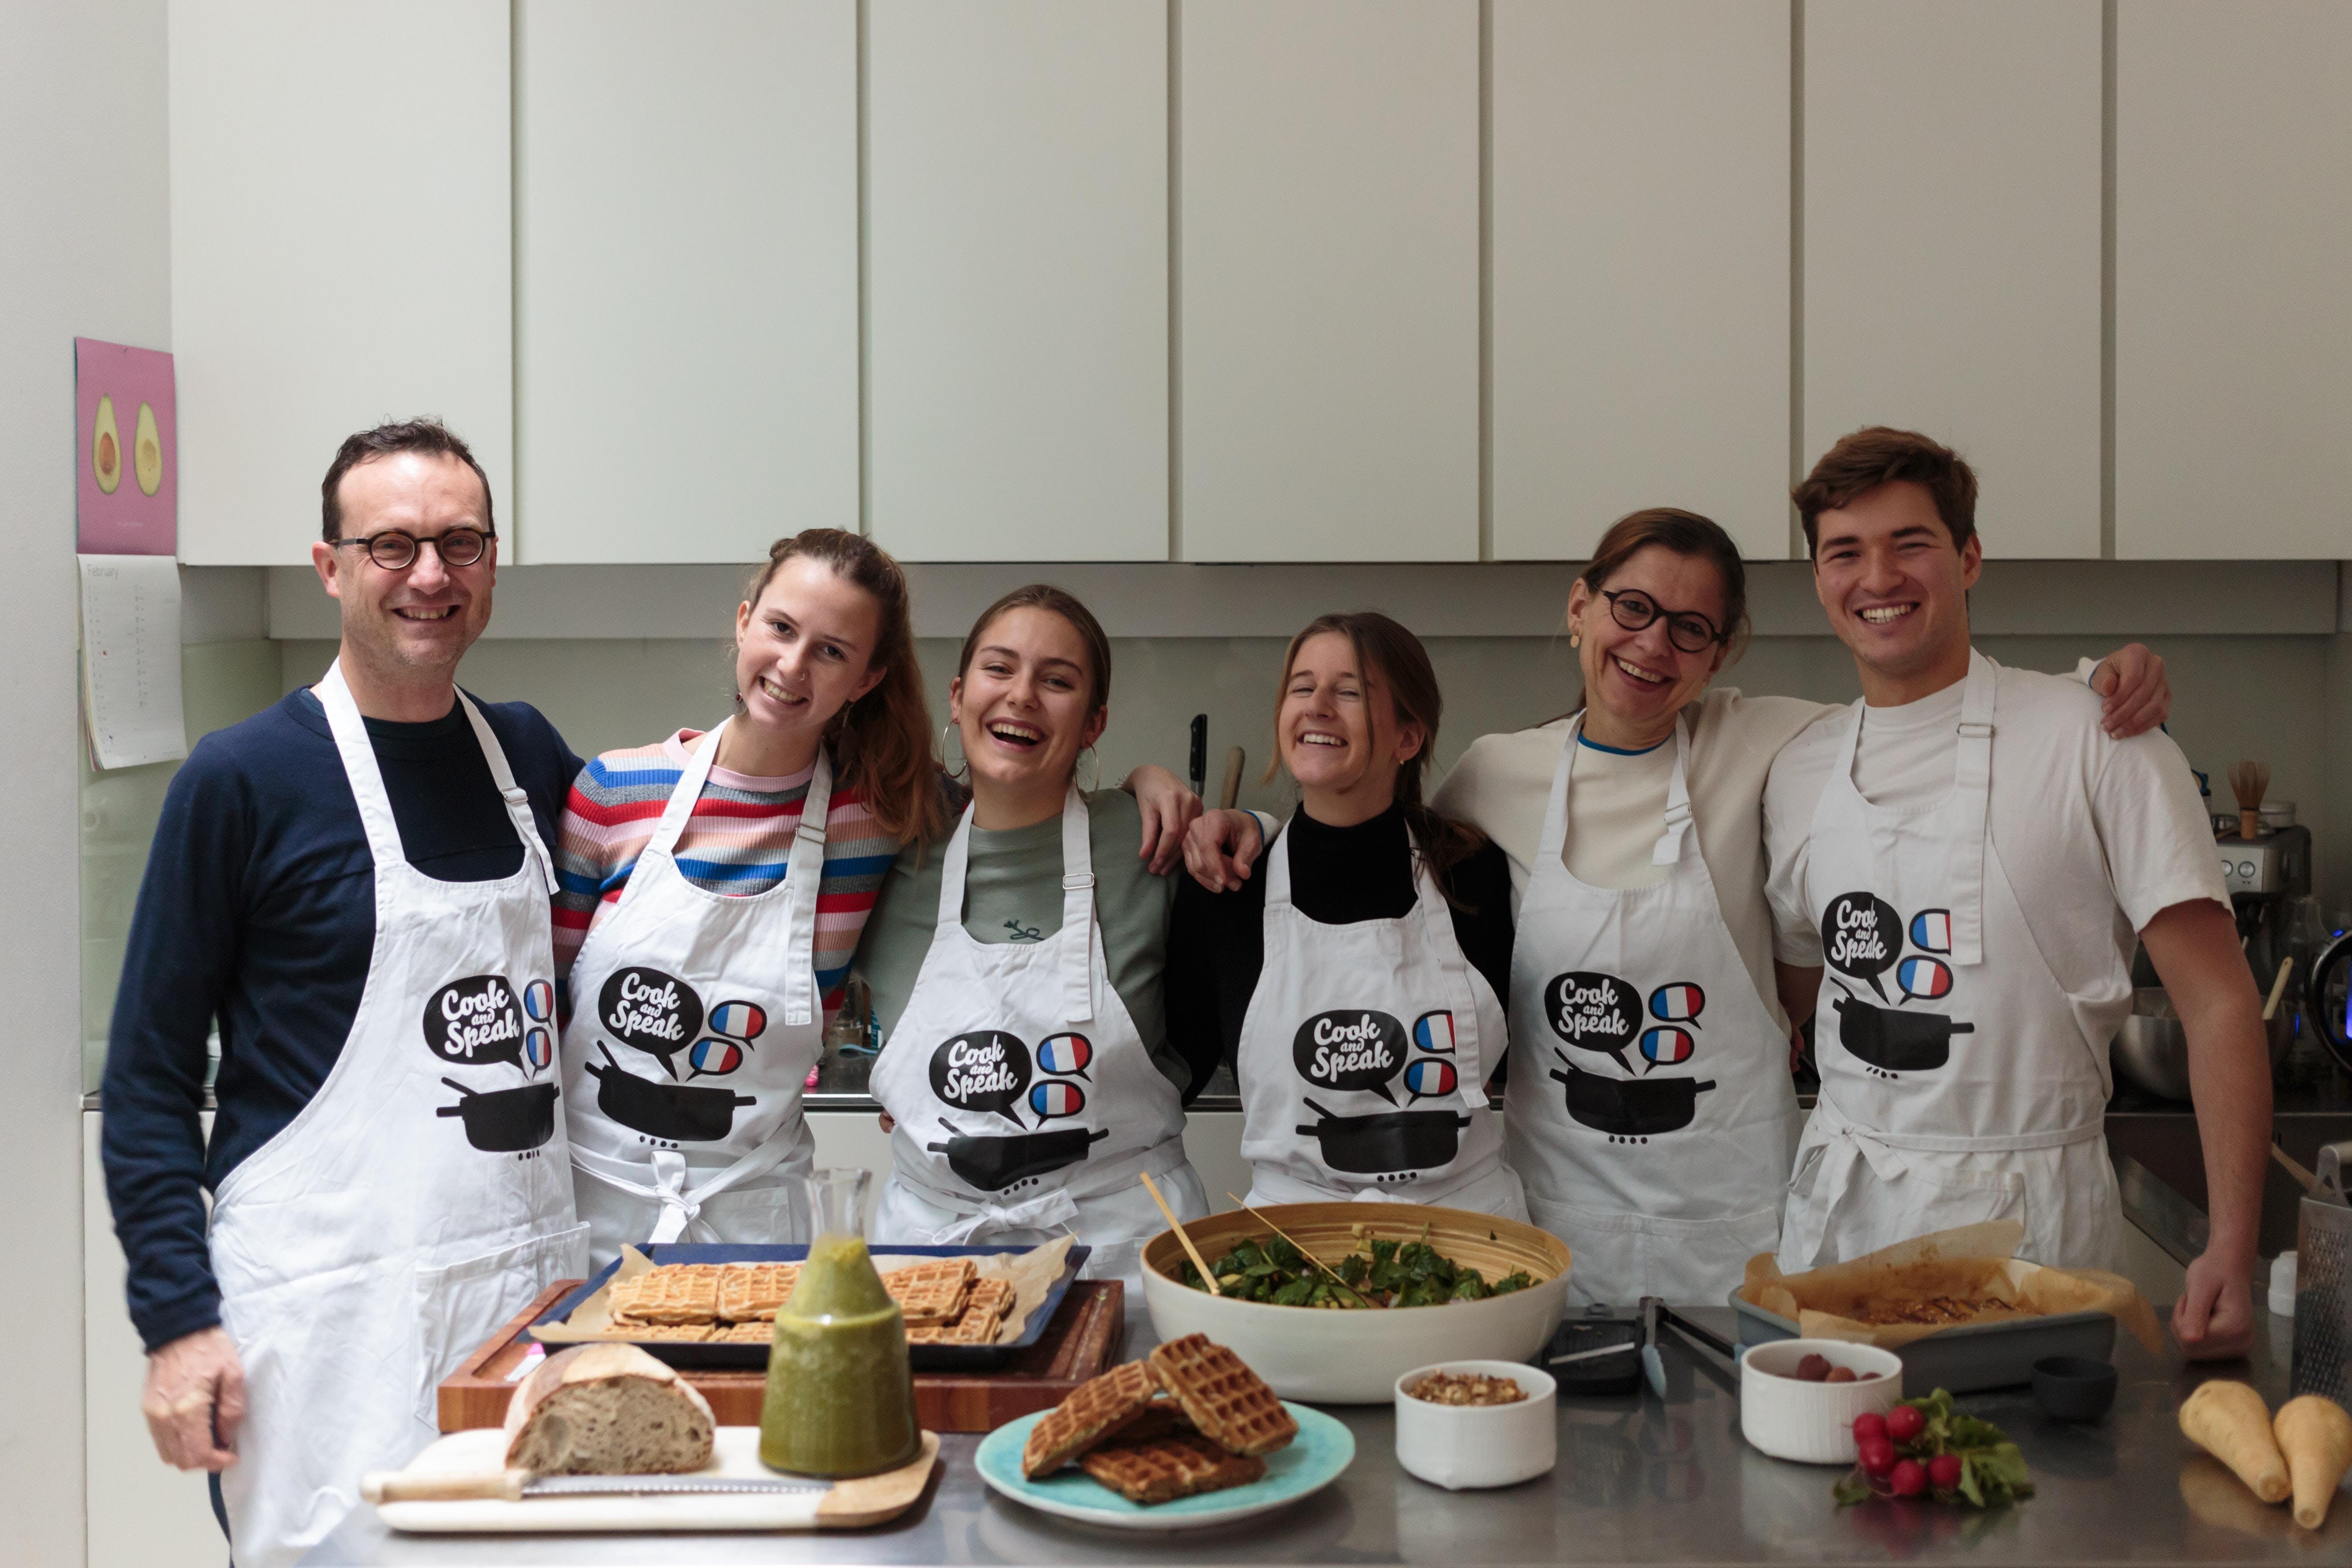 COOK AND SPEAK BRUNCH: Les 5 sens en cuisine